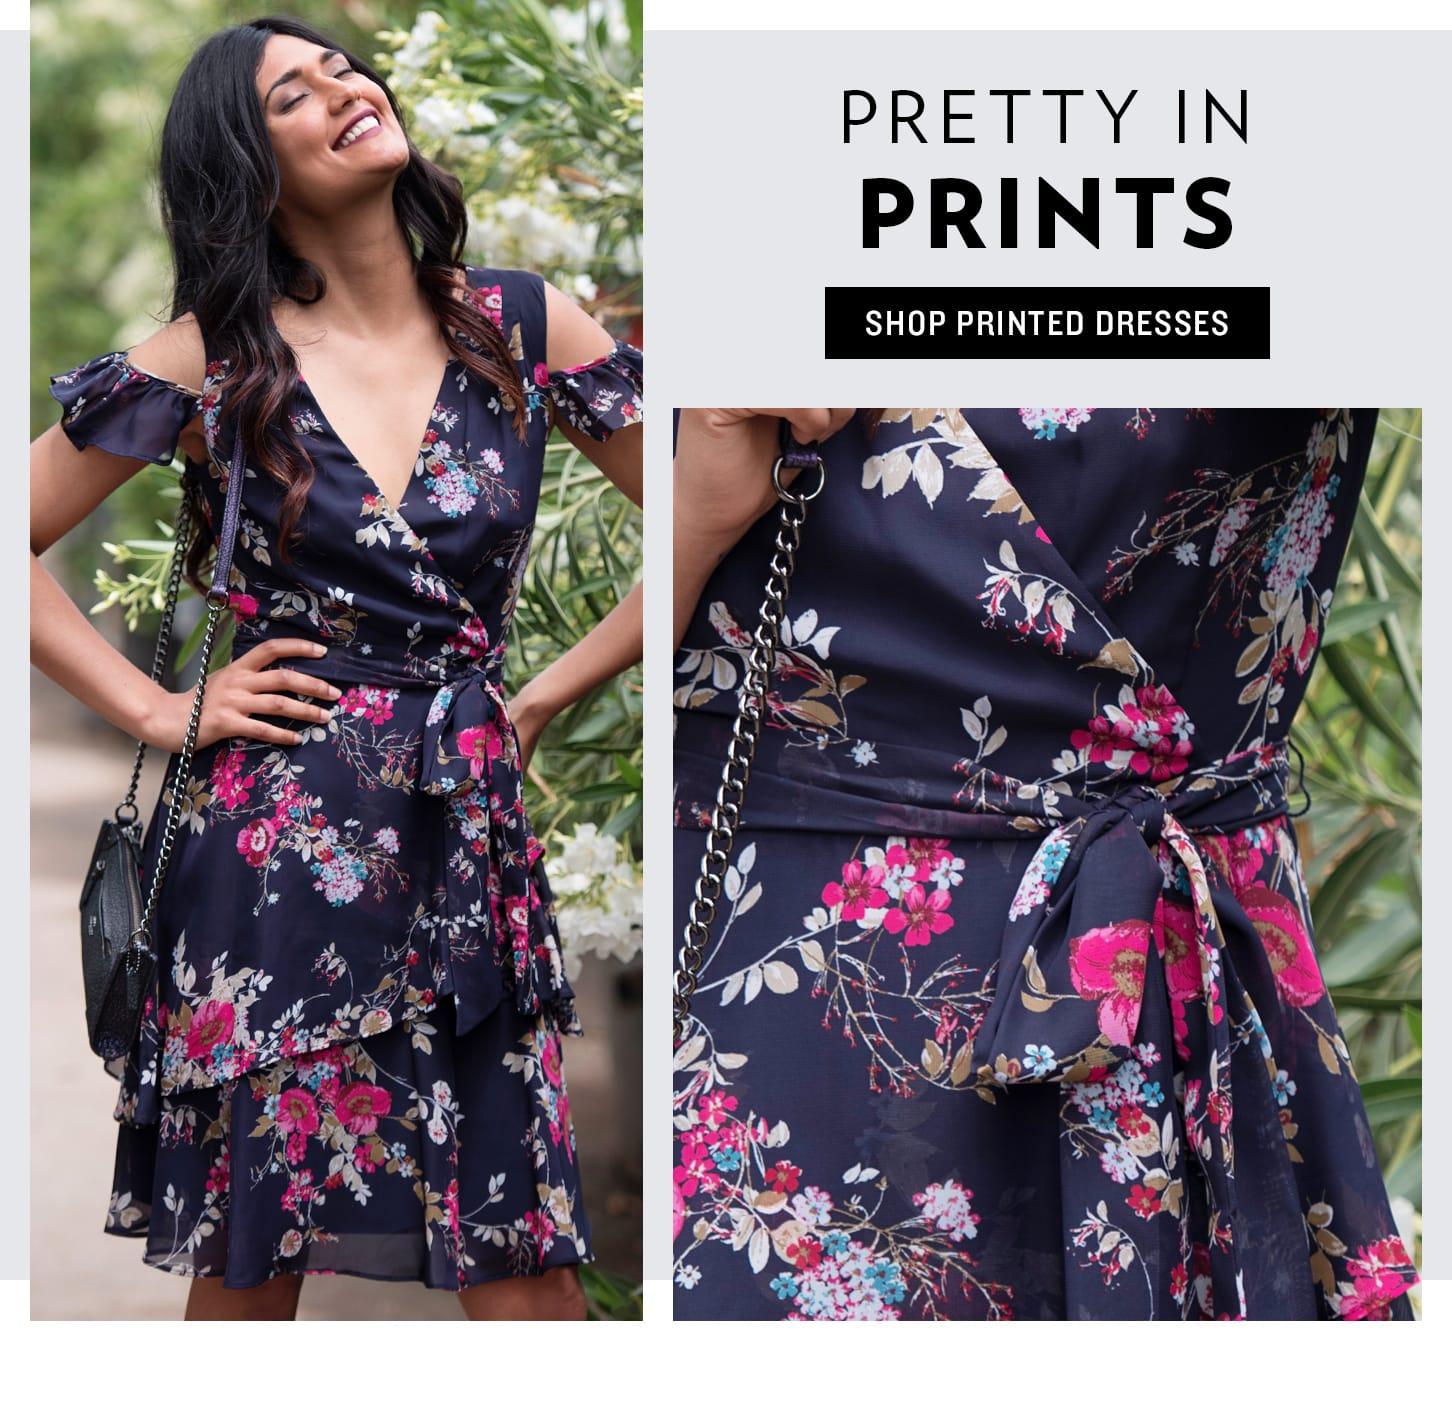 Shop Printed Dresses